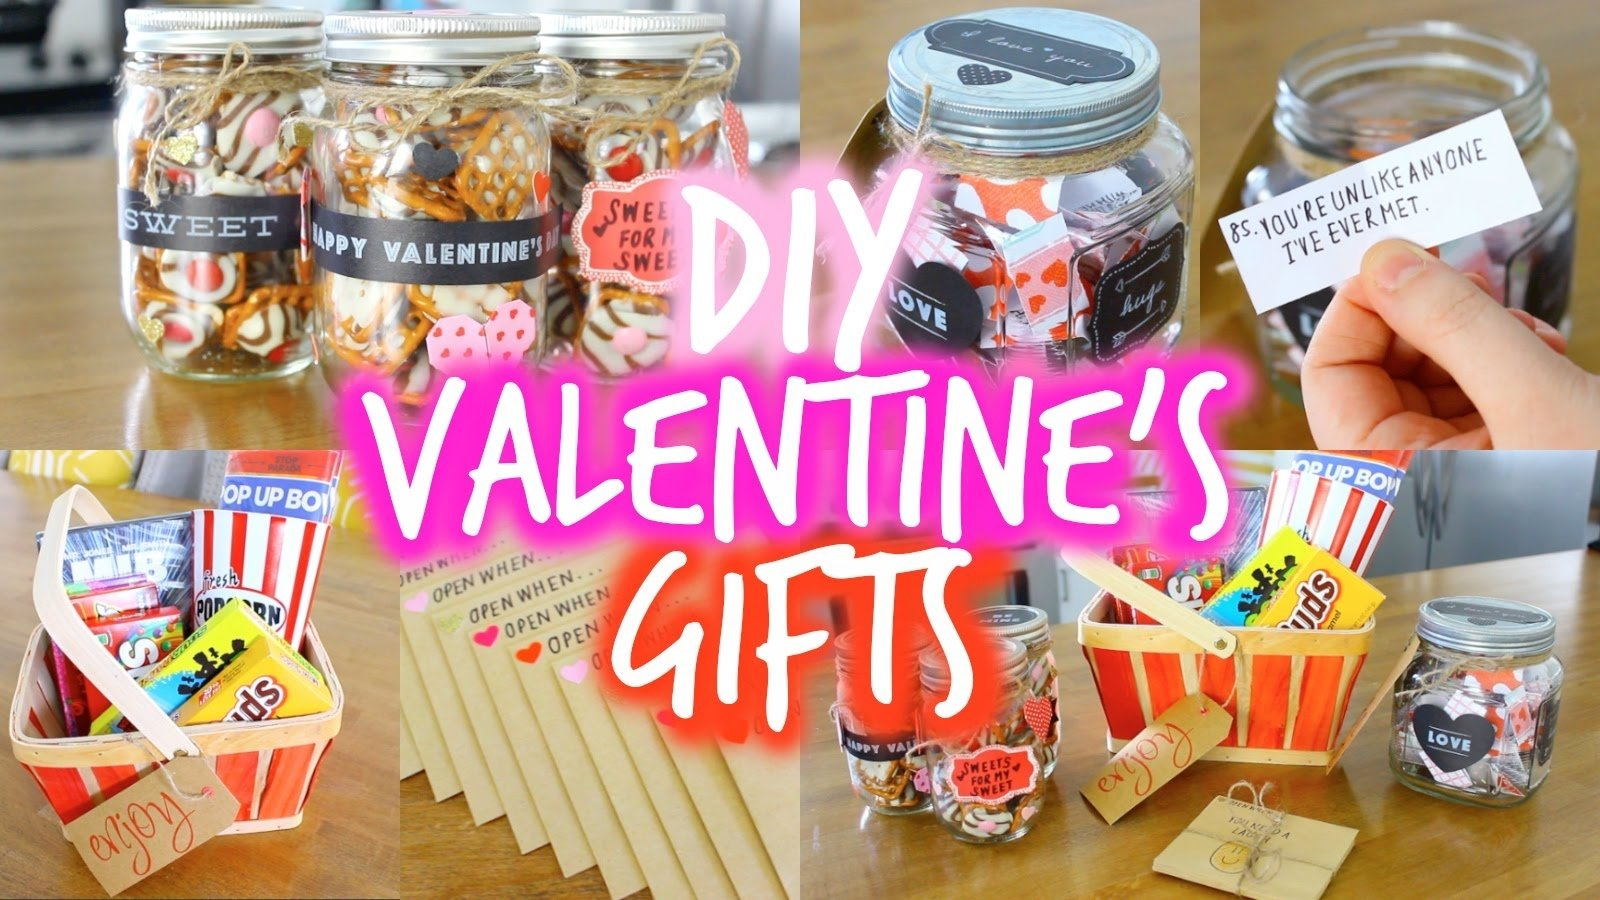 10 Fashionable Valentines Day Ideas For Boyfriend easy diy valentines day gift ideas for your boyfriend youtube 3 2021